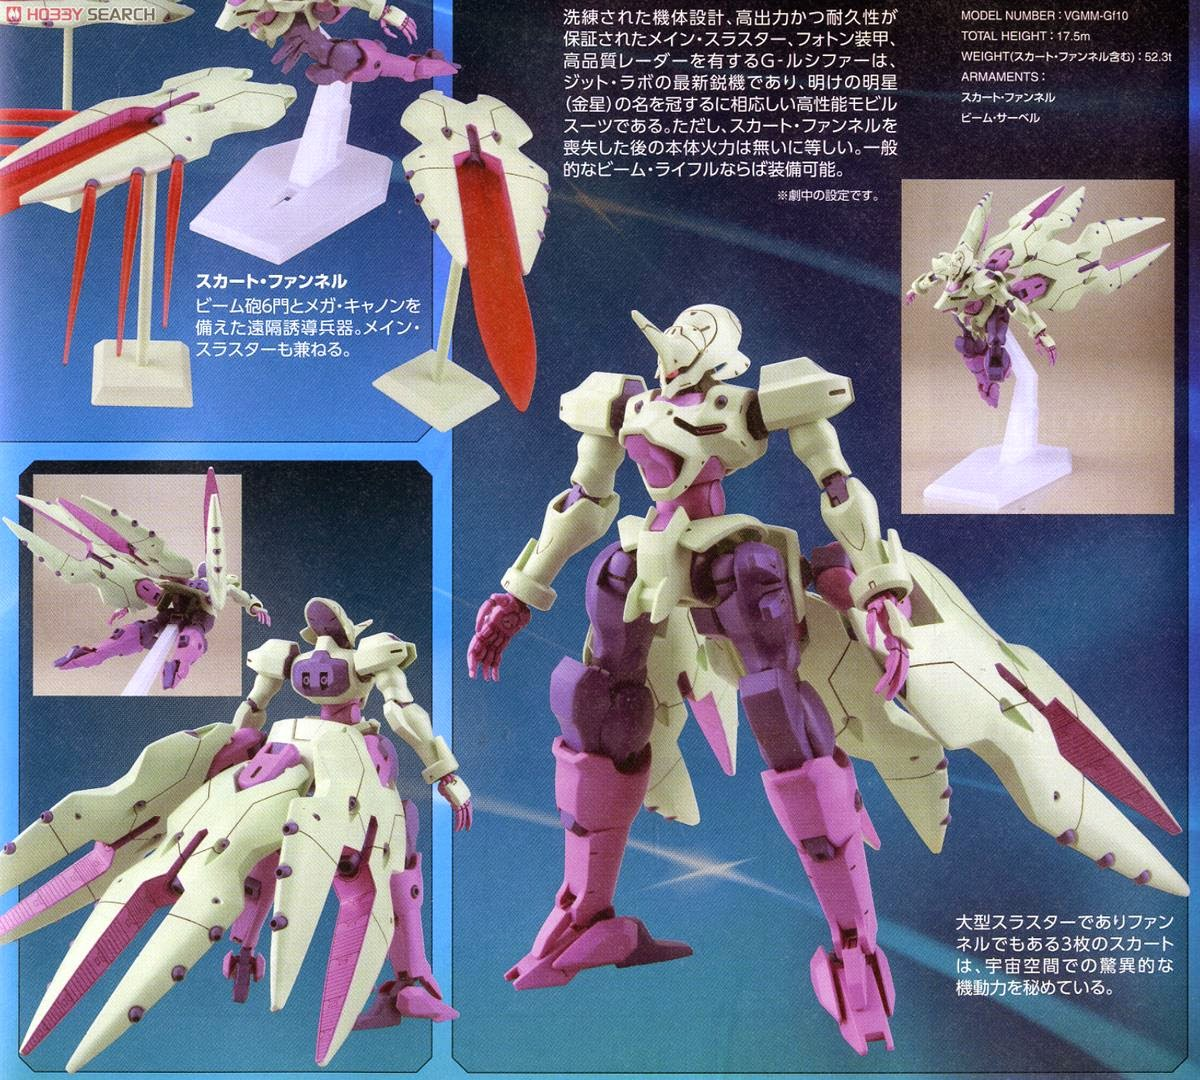 GUNDAM GUY: HG 1/144 Gundam G-Lucifer